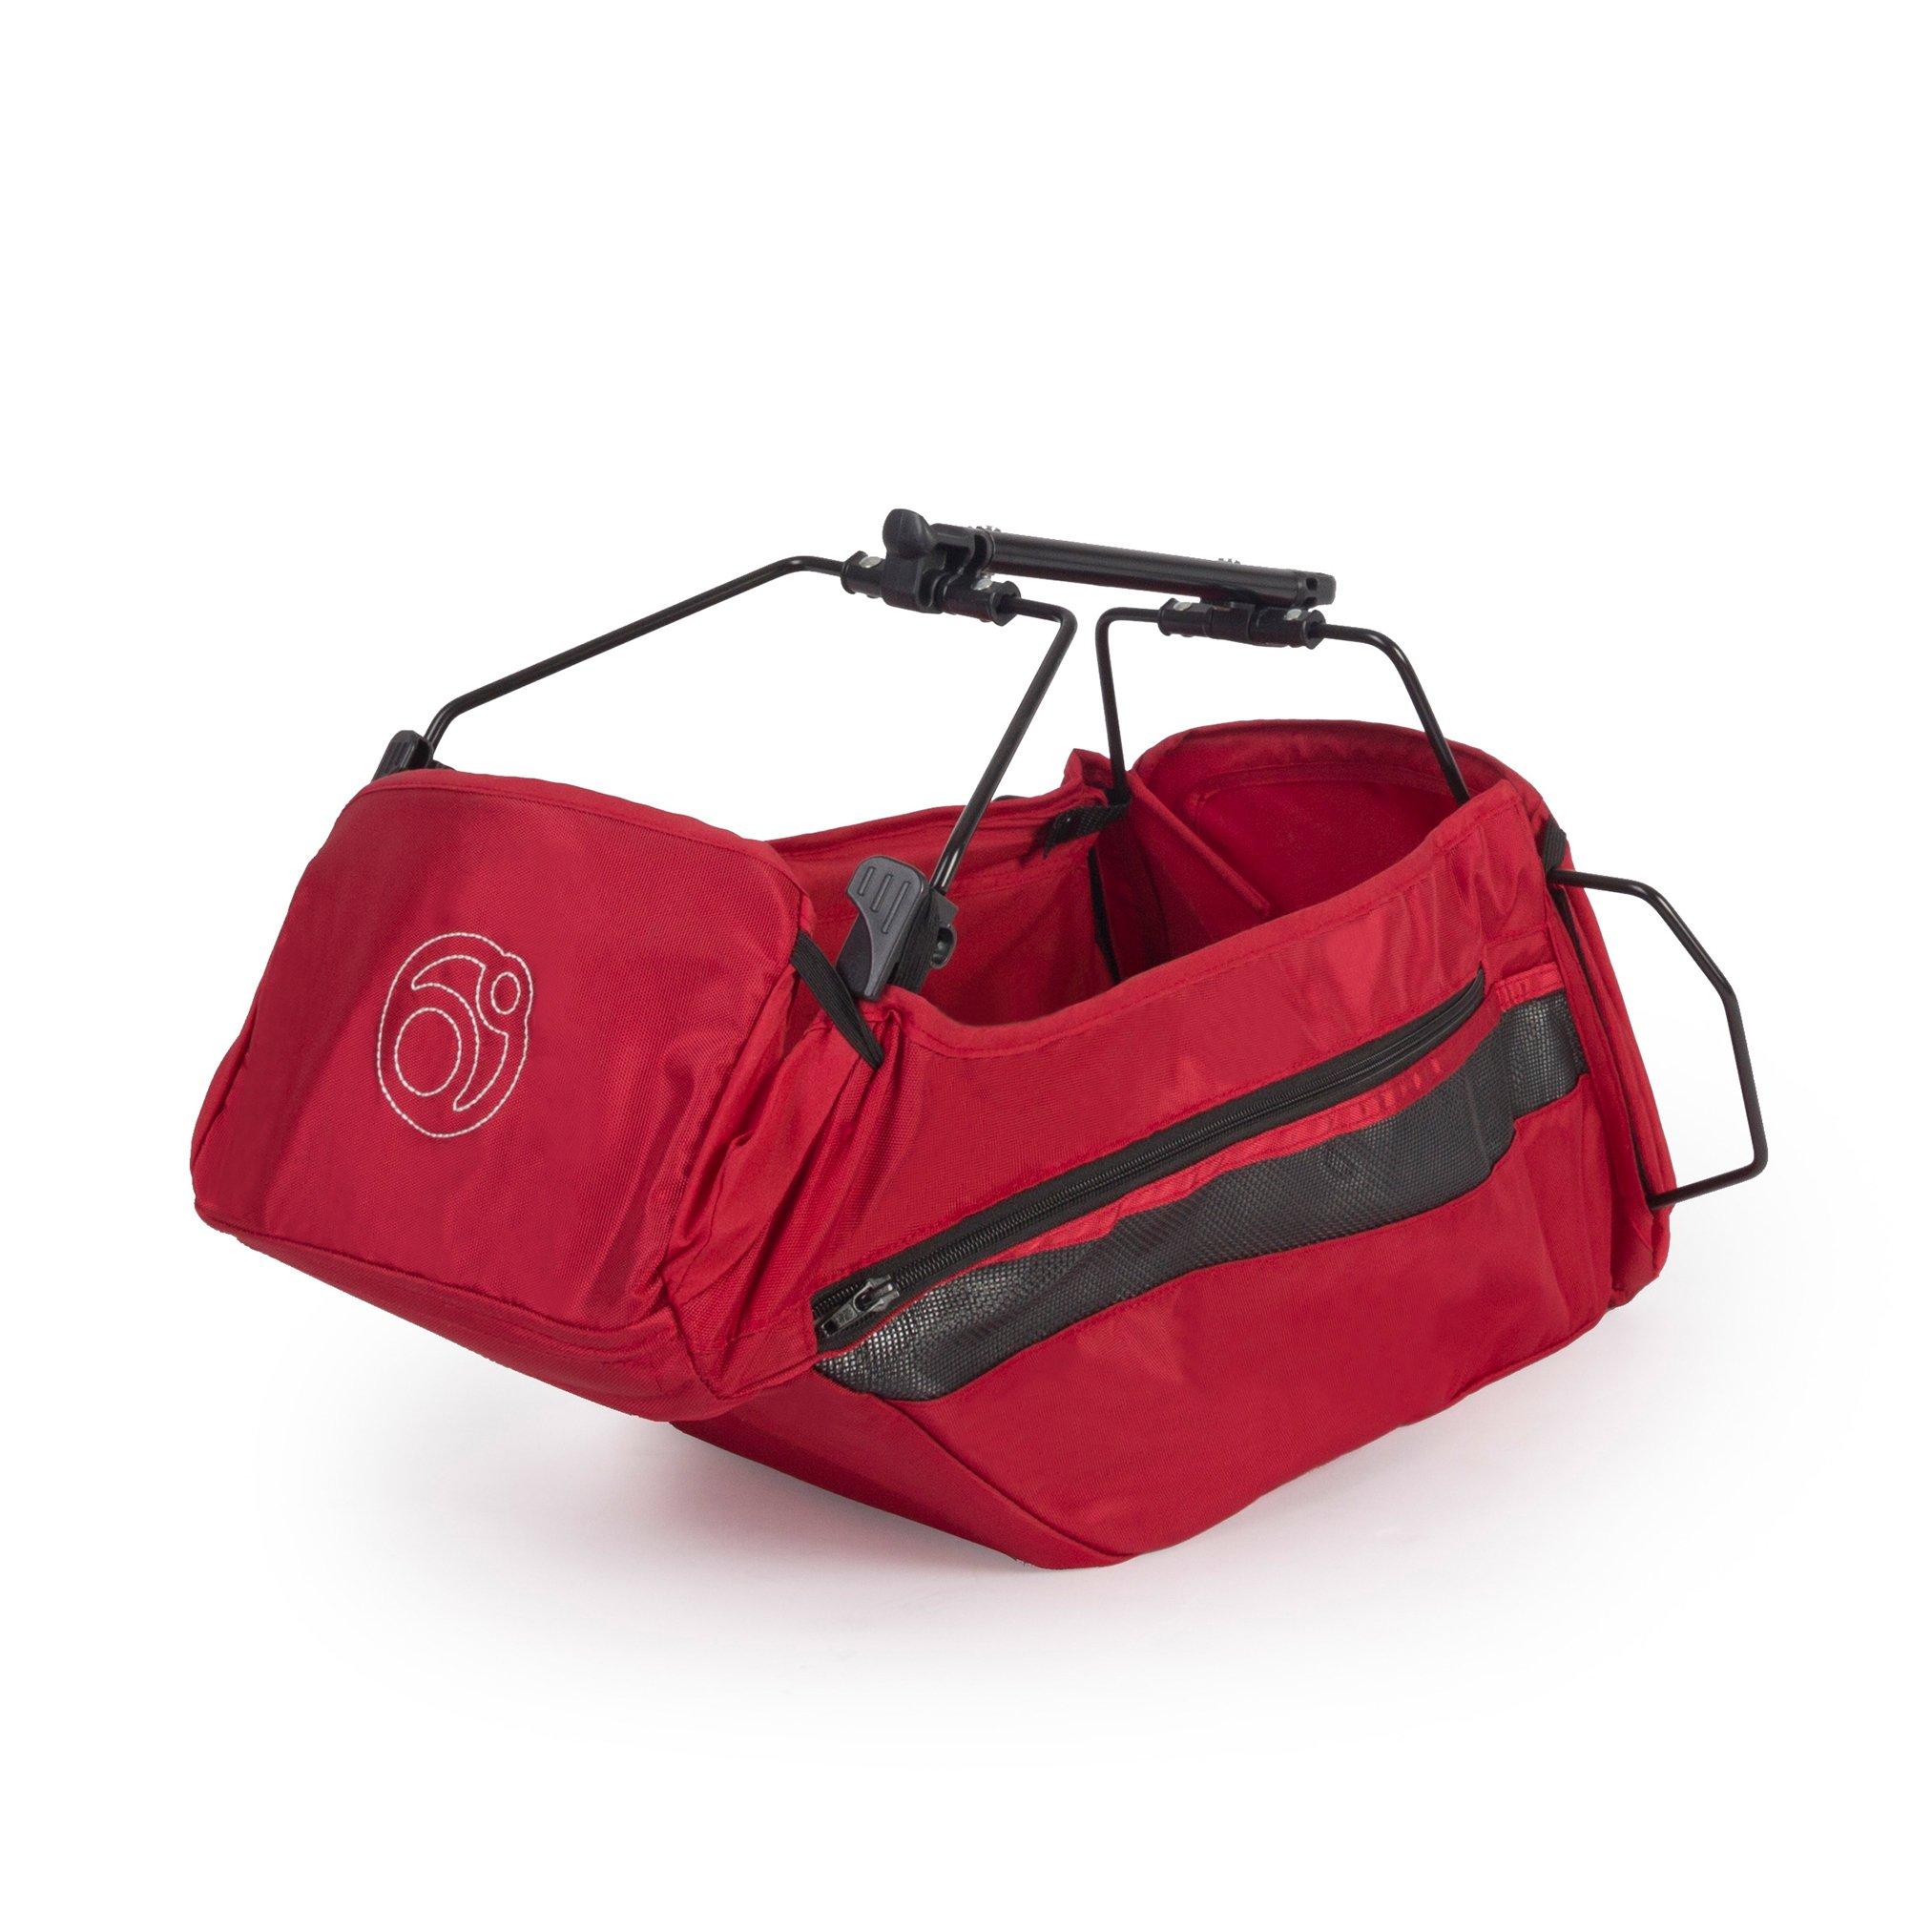 Orbit Baby G3 Stroller Cargo Basket, Ruby